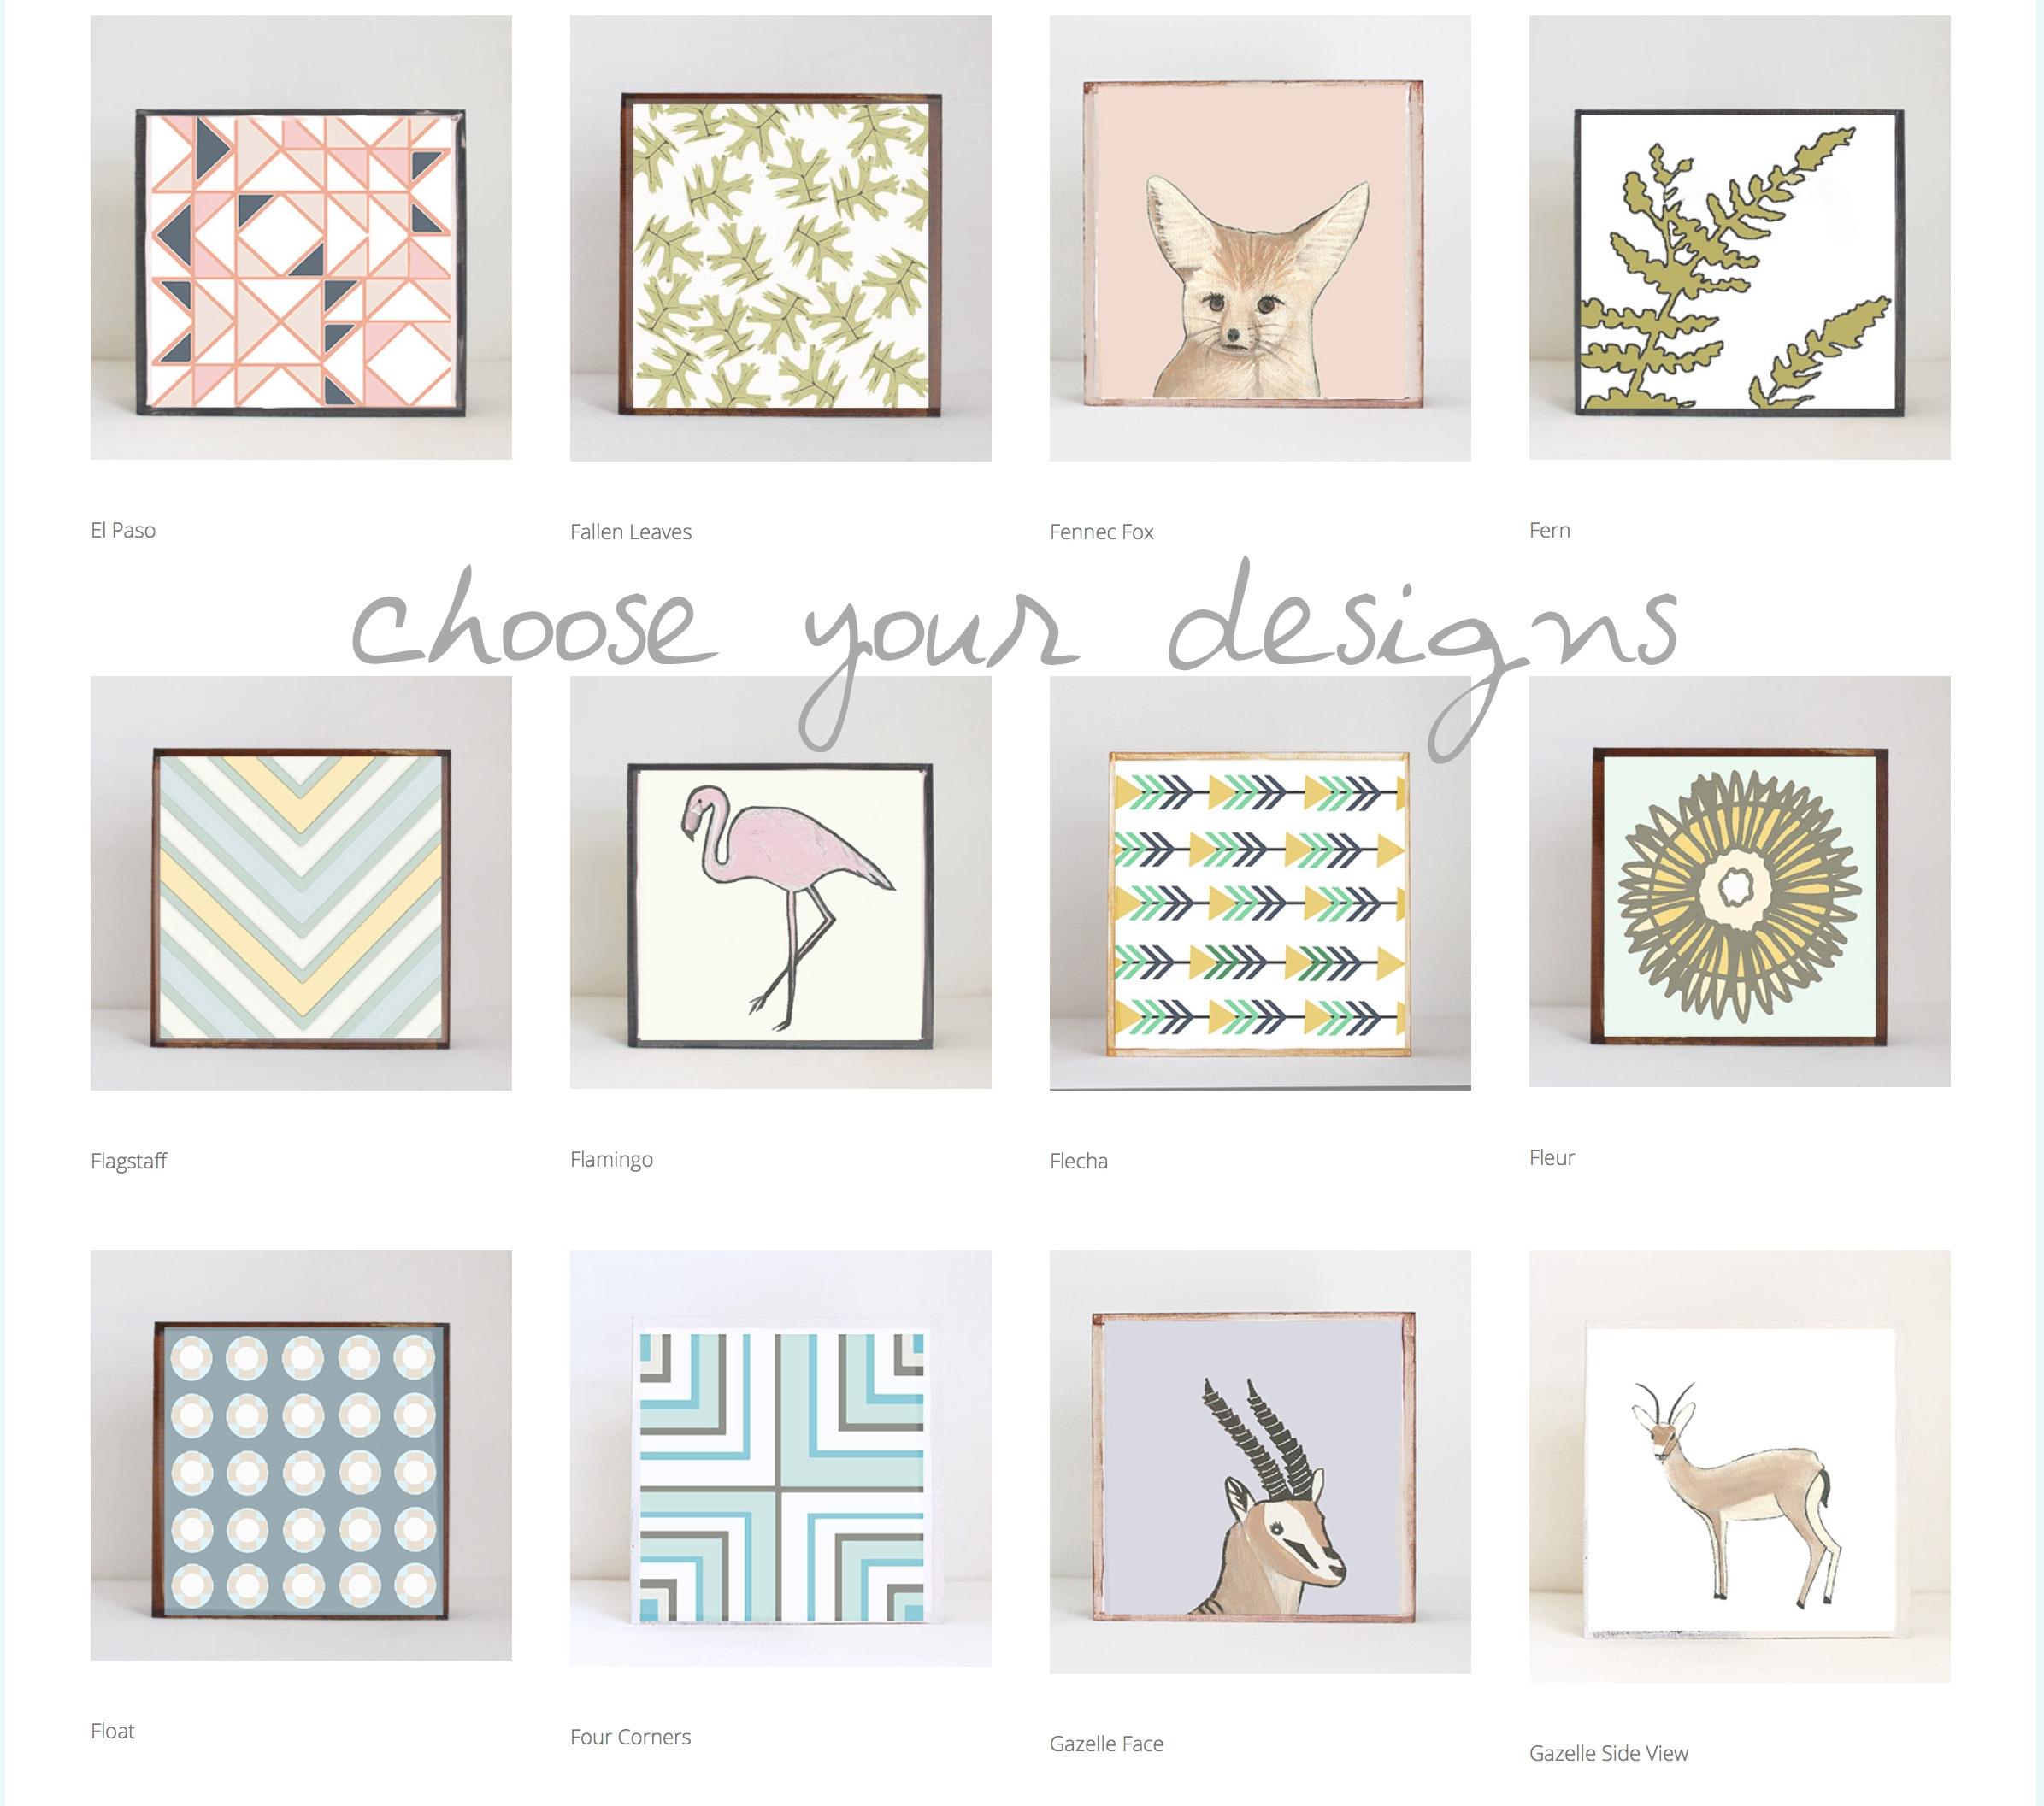 designs main website image.jpg